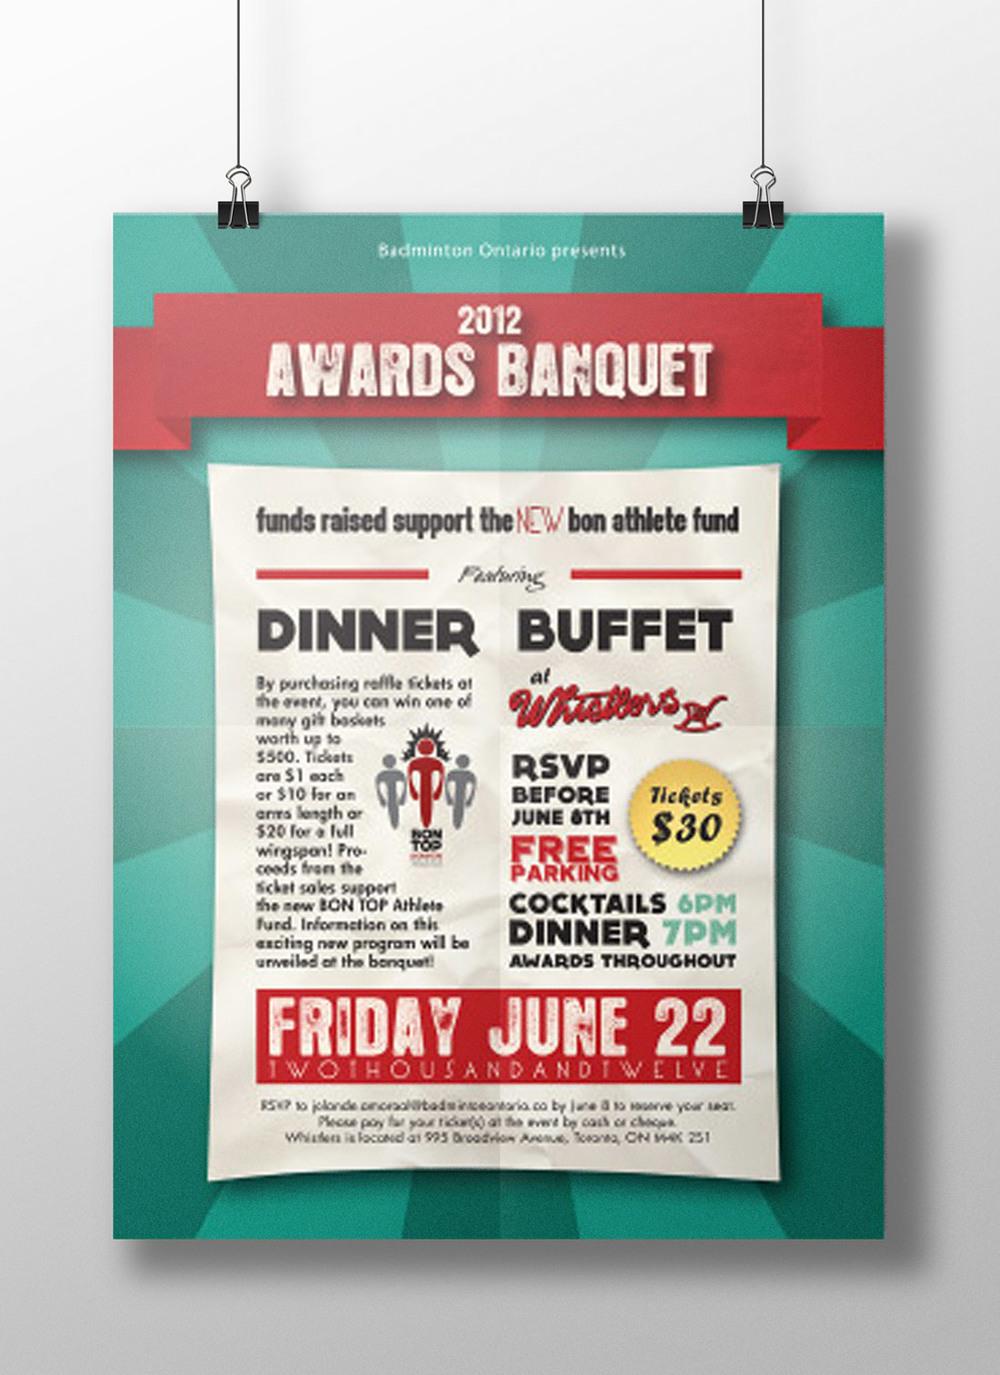 Awards-Banquet-poster.jpg